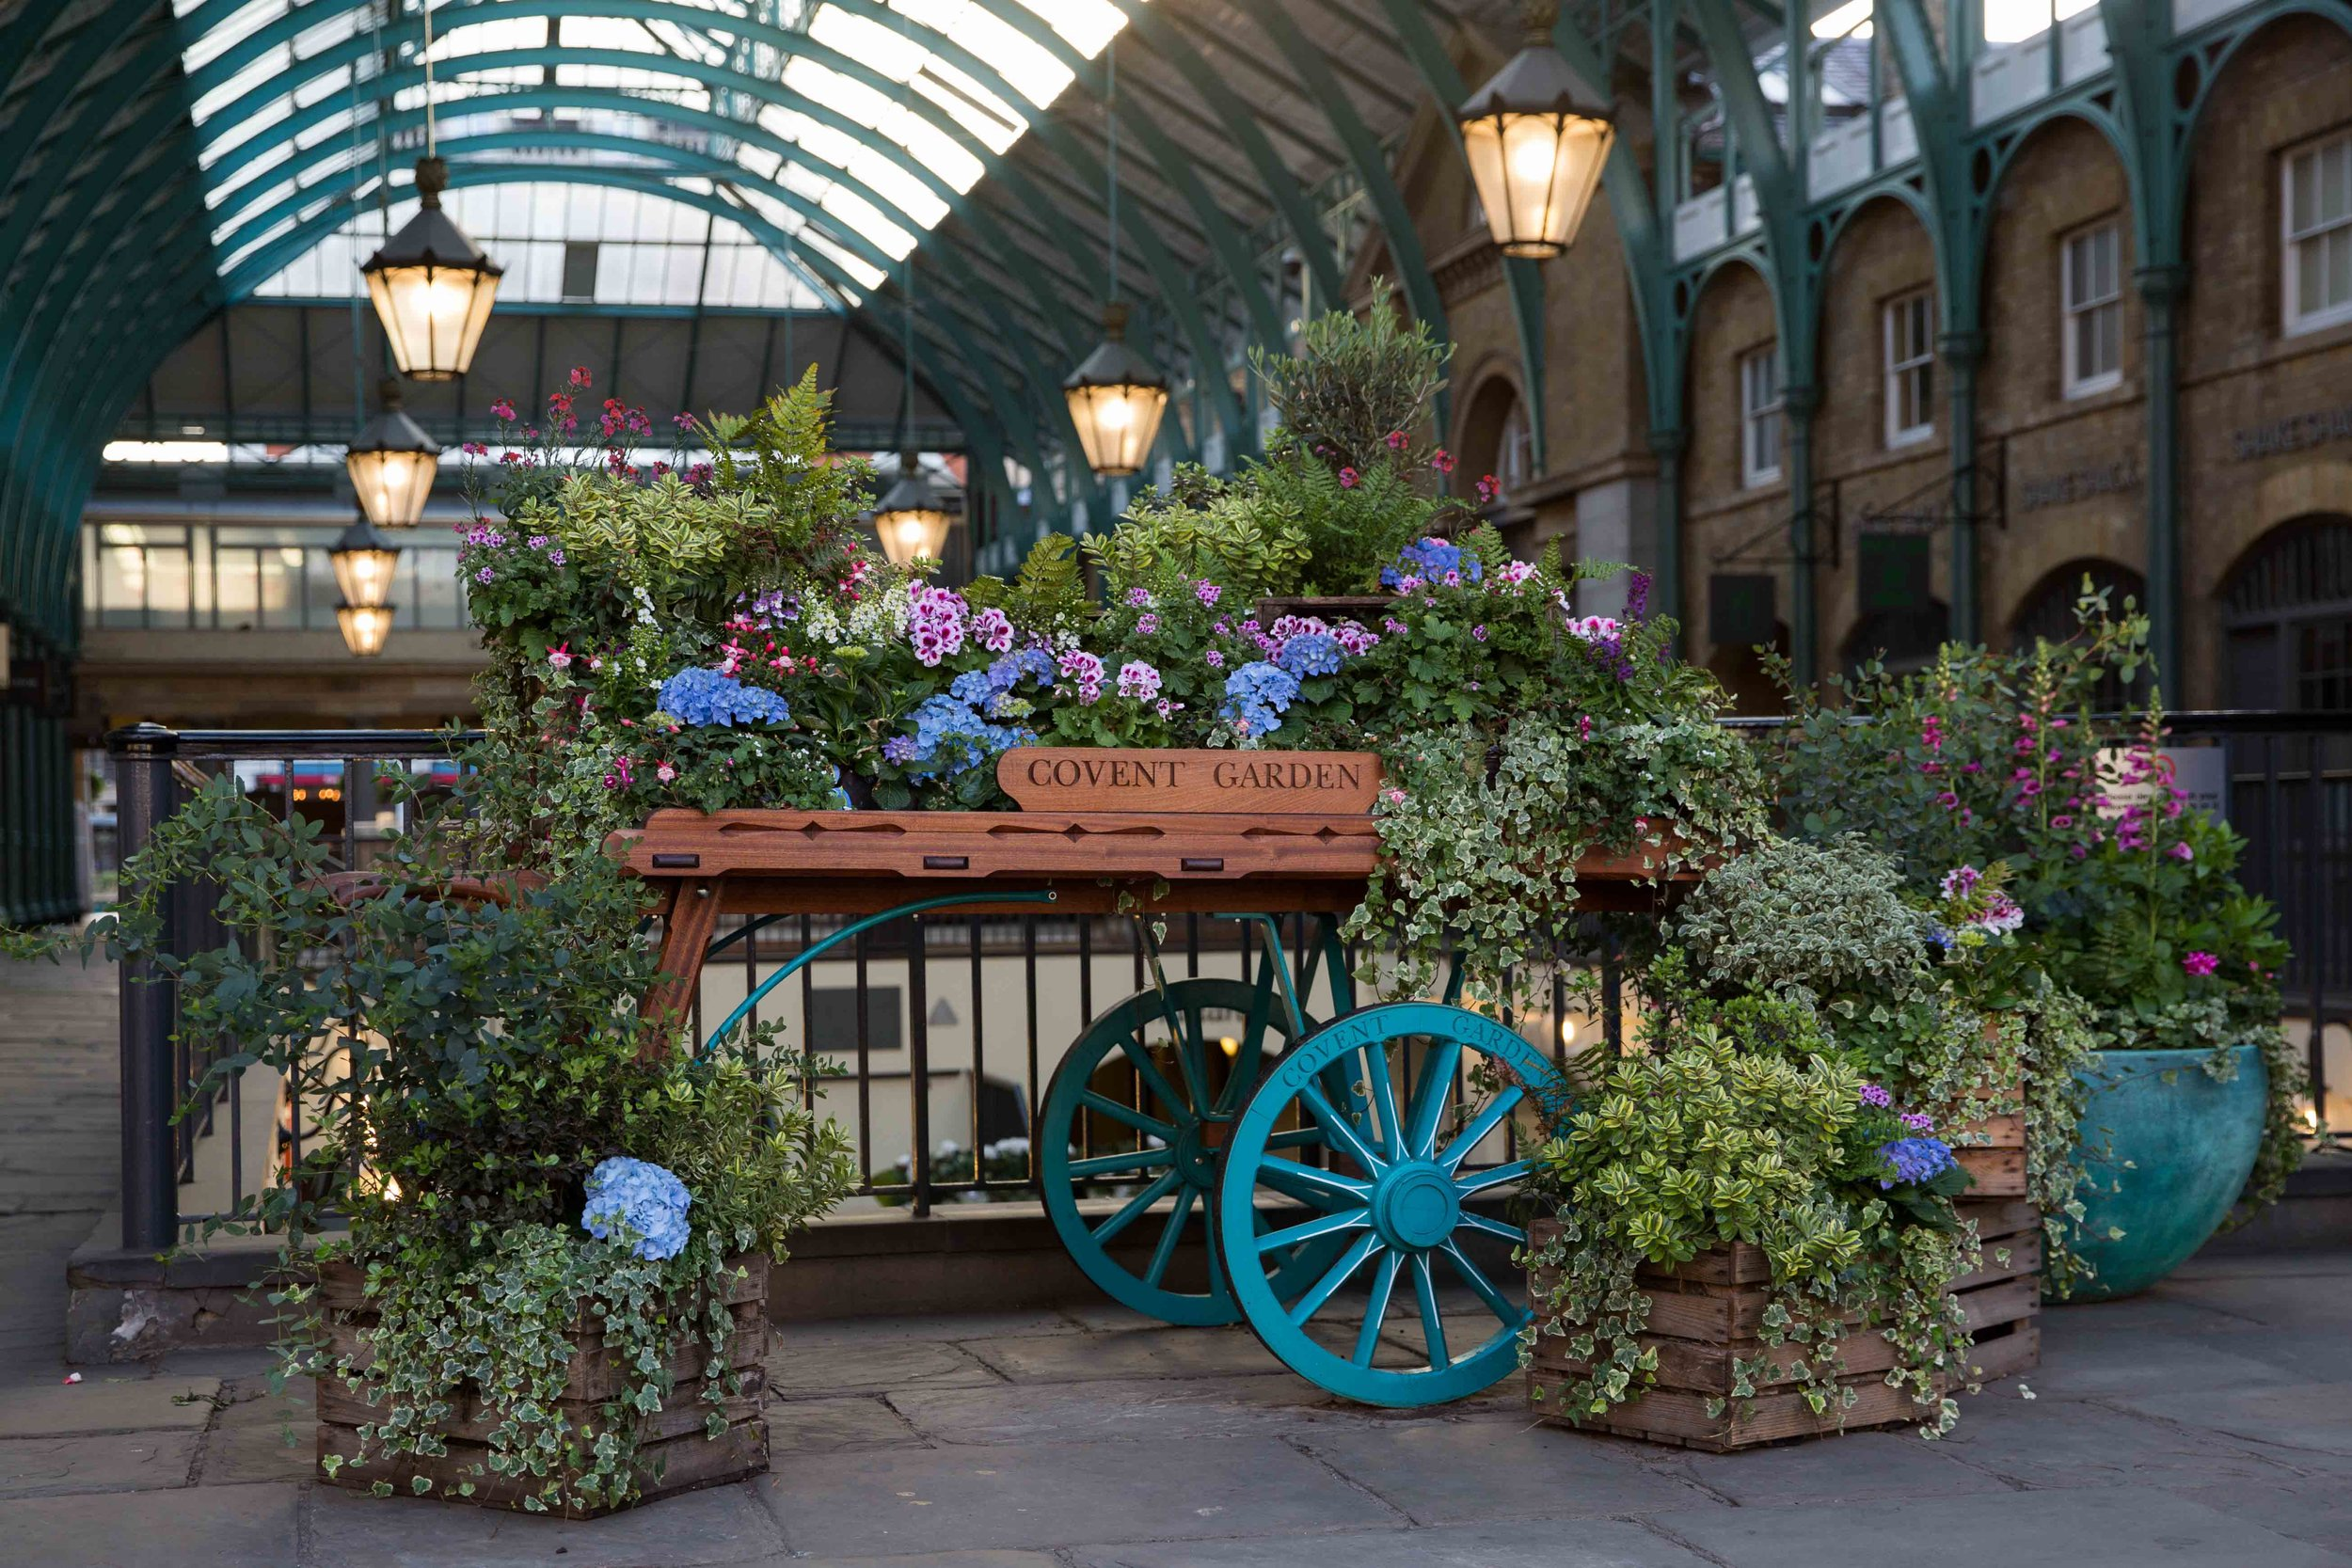 JCTP0104-Covent Garden-London-UK-mcconaghy-3.jpg